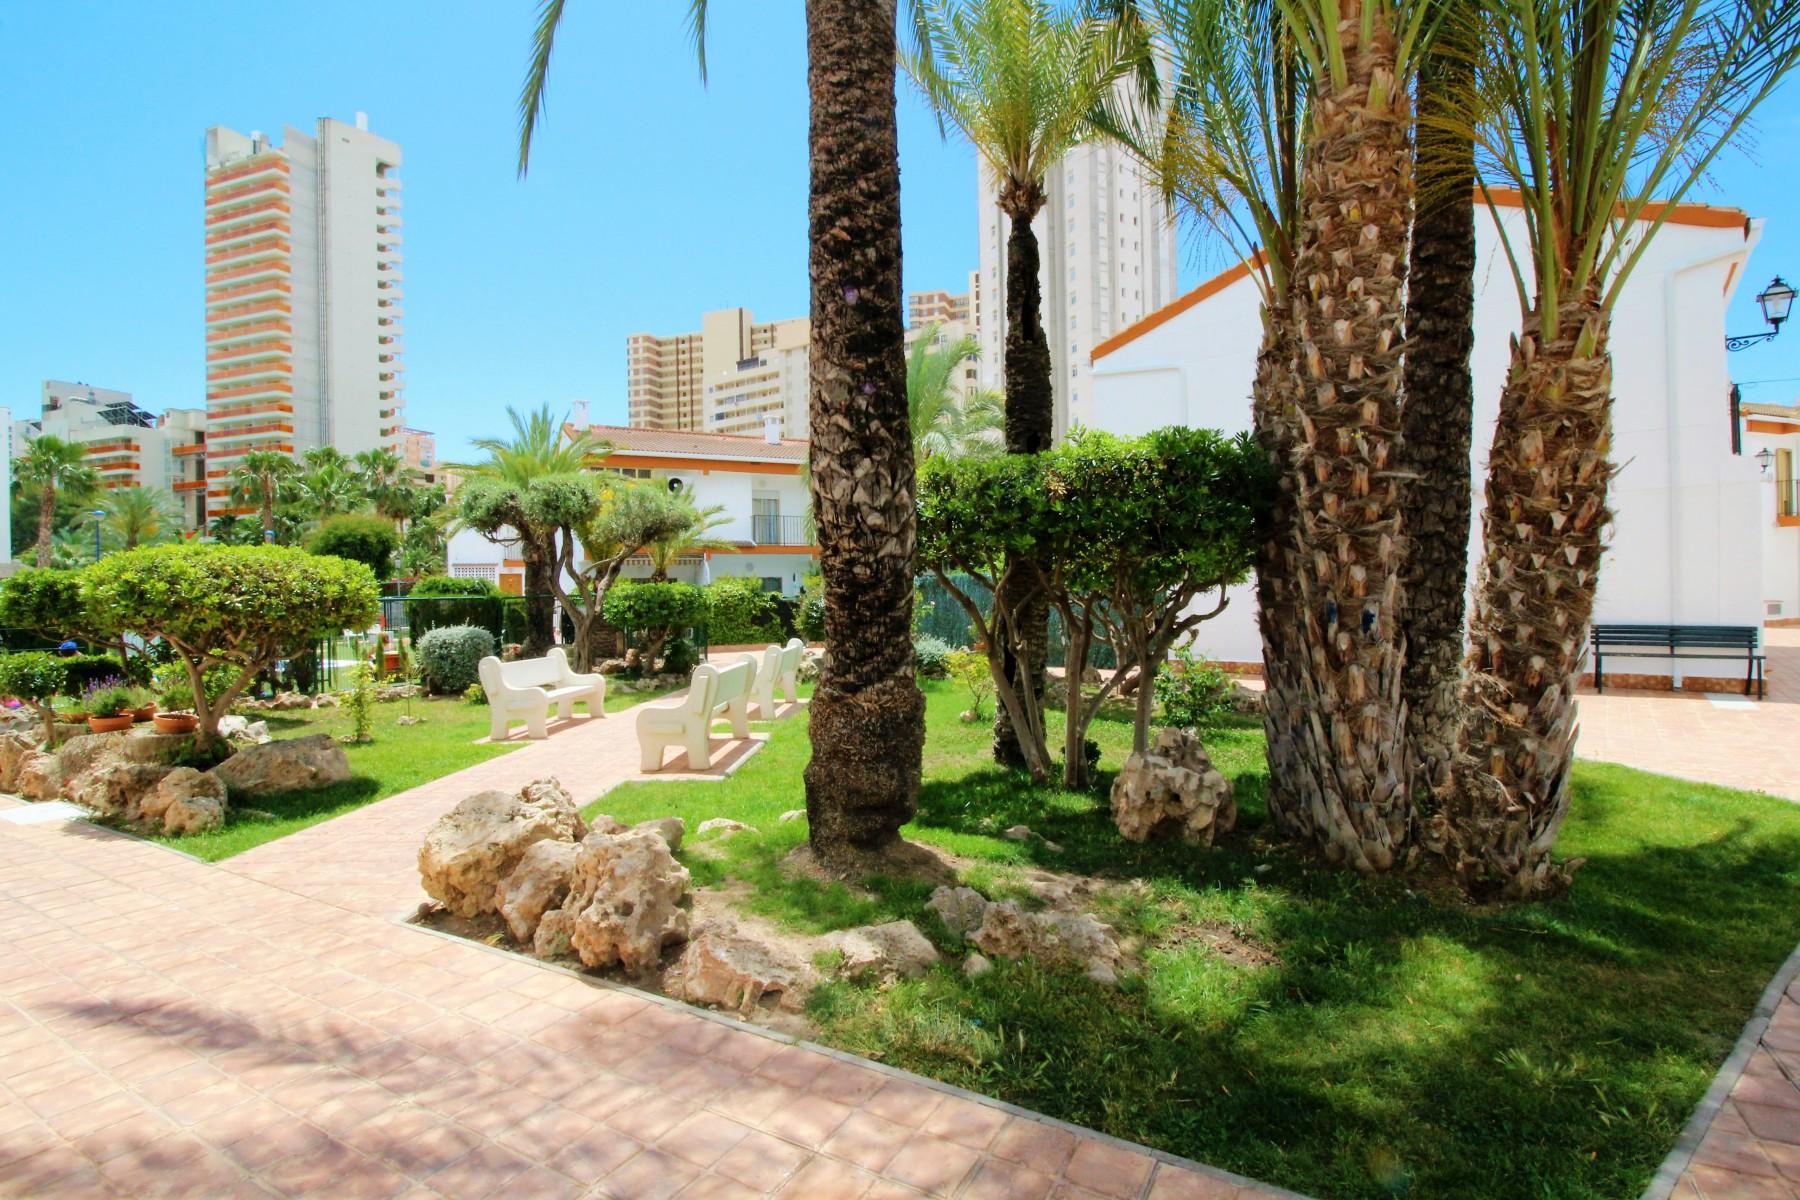 Rinconada Real 235 - Apartments in Benidorm